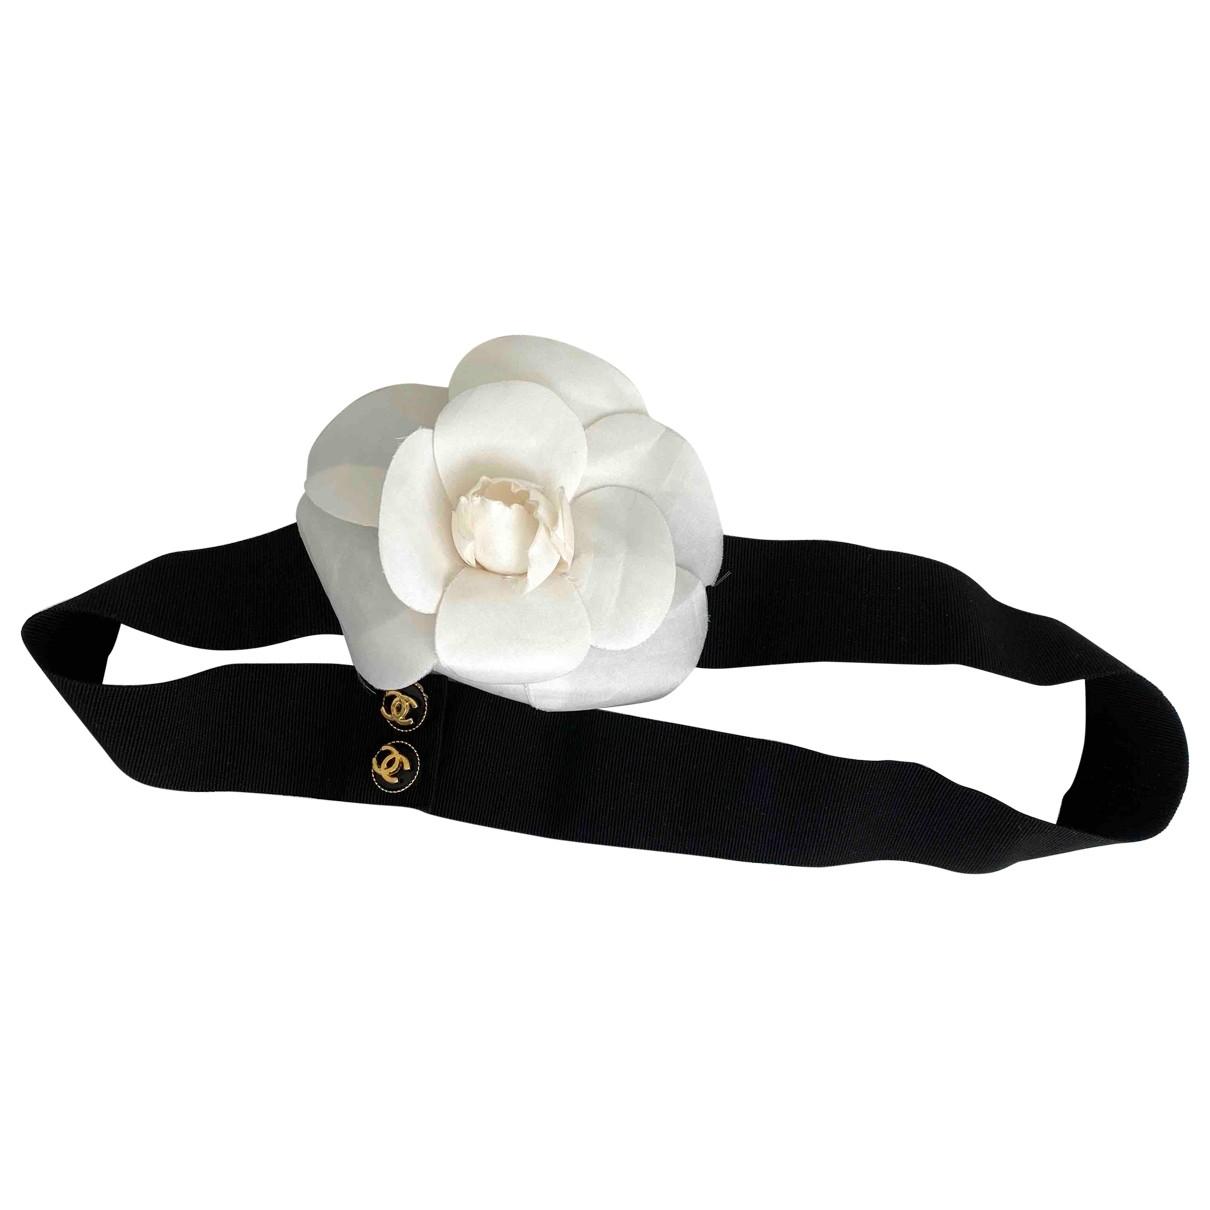 Cinturon de Seda Chanel